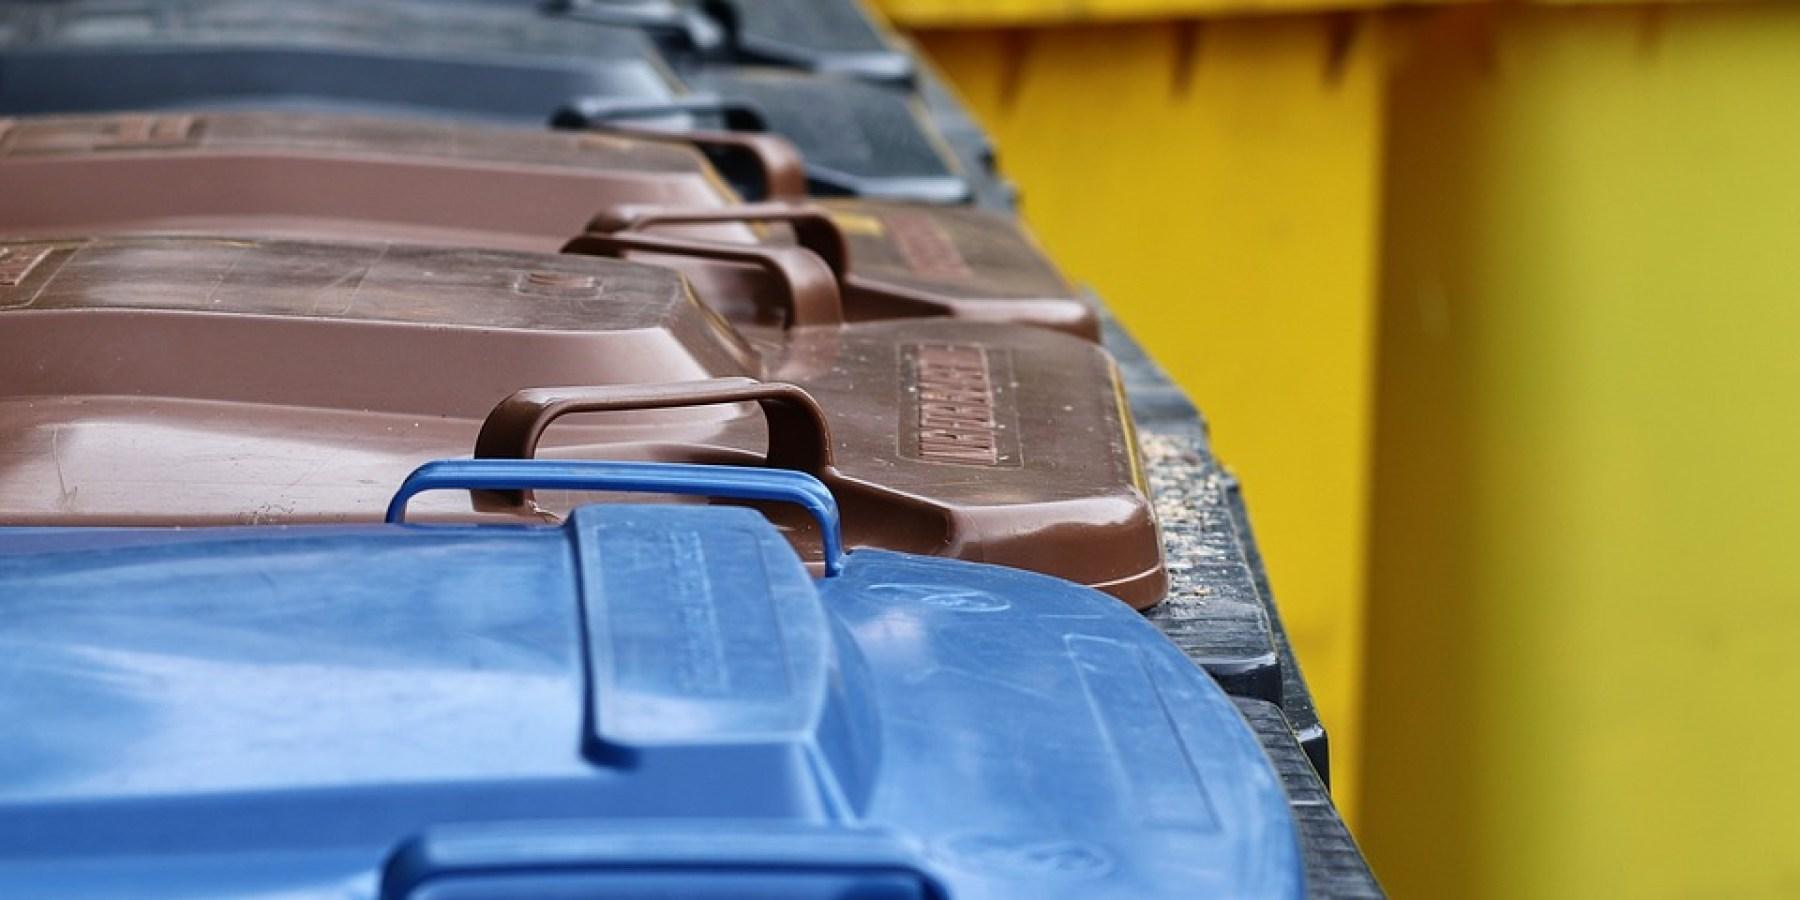 AWM öffnen testweise vier Stadtteil-Recyclinghöfe